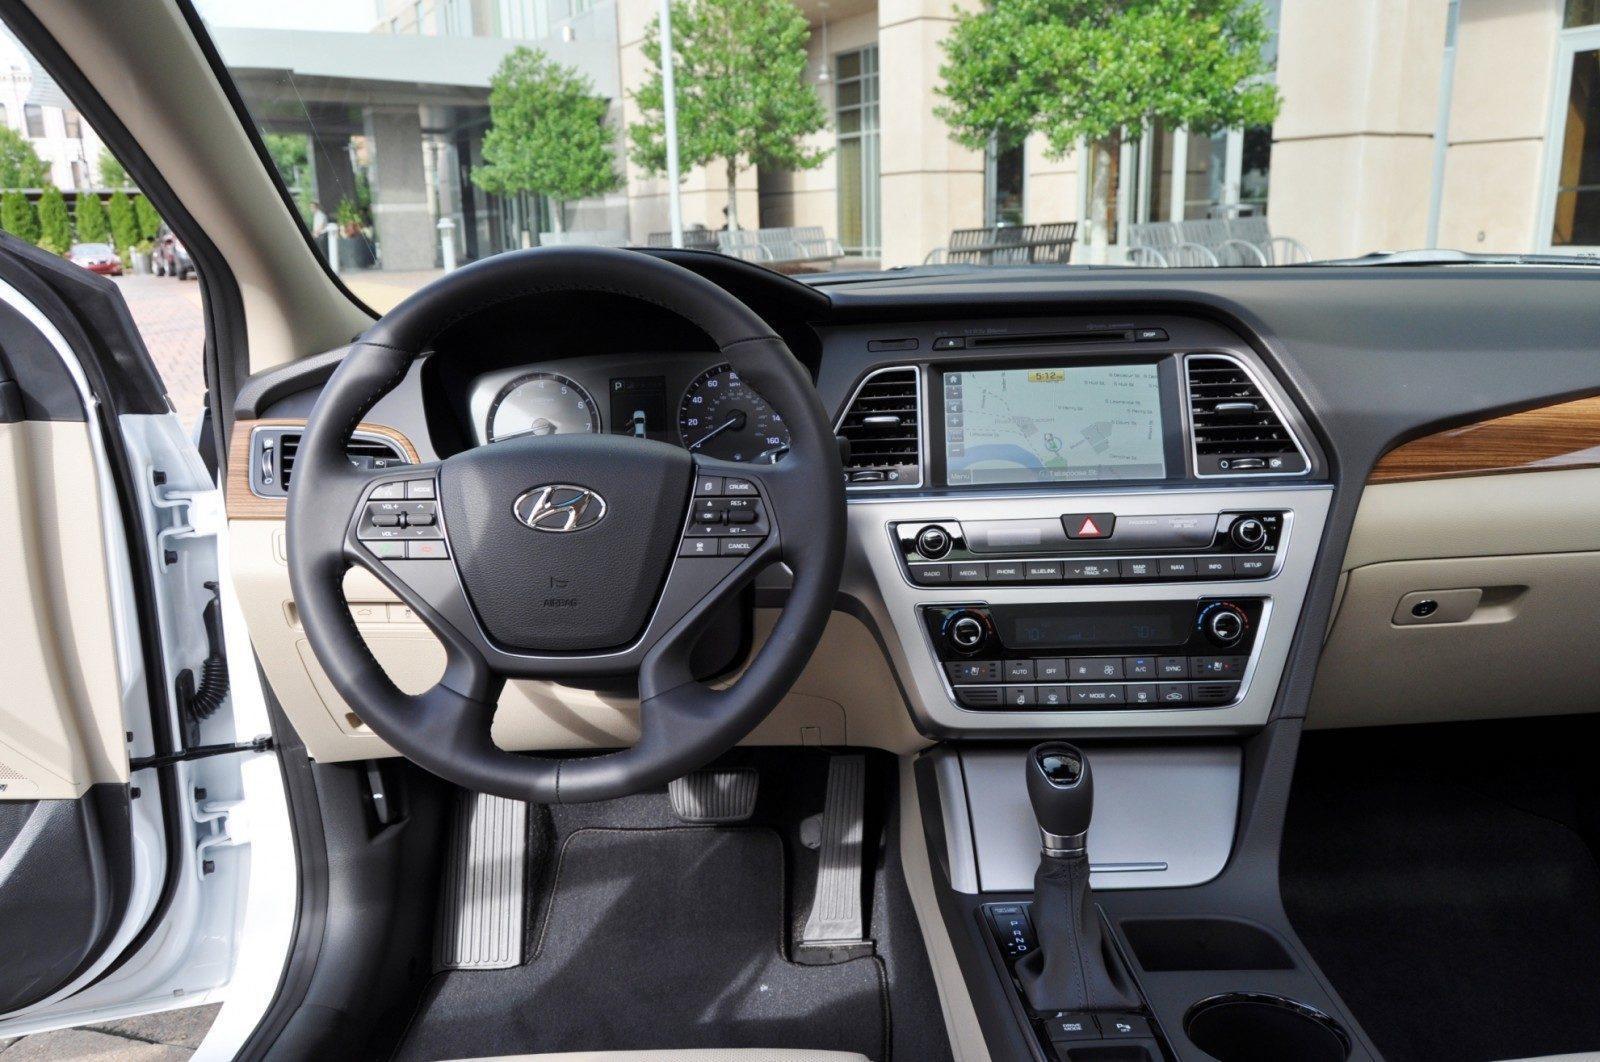 Road Test Review 2015 Hyundai Sonata Interior Focus 2 4l Limited 24 Car Revs